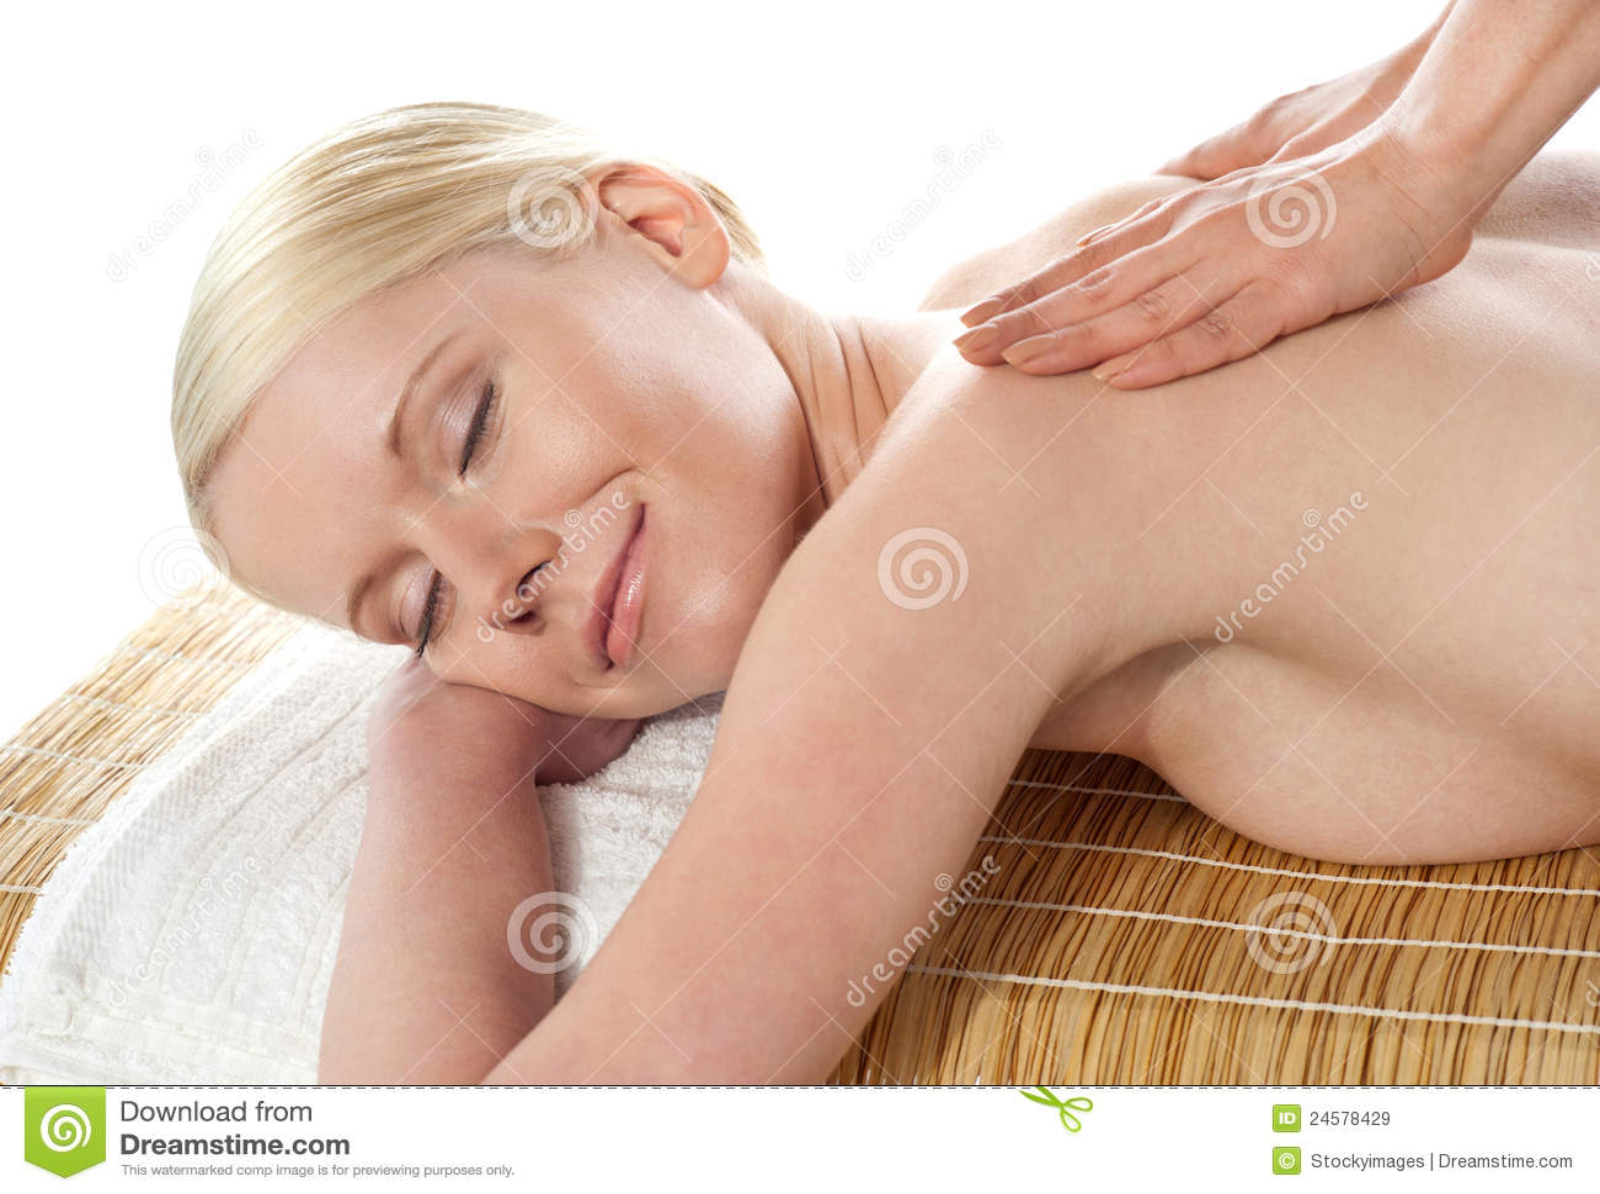 erotisk massage gävle pornosex